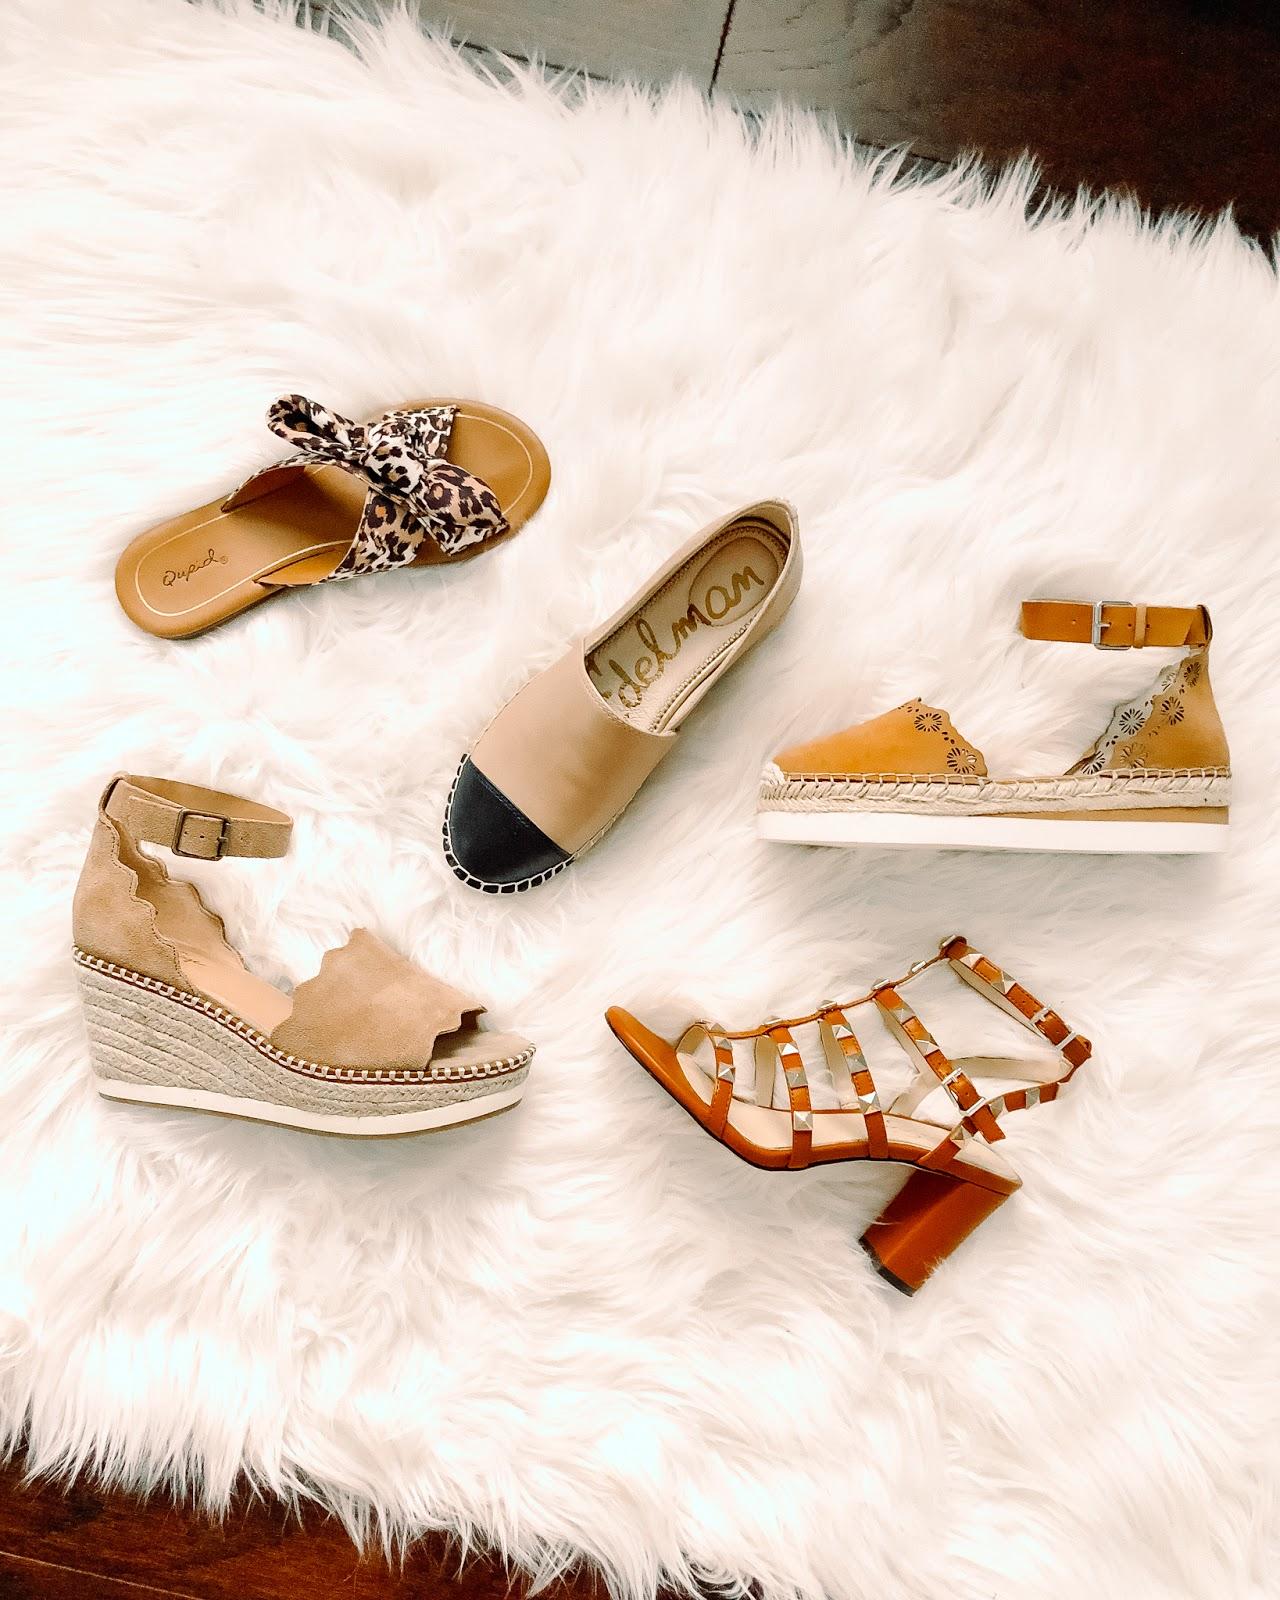 espadrilles, sam edelman, rockstud heels, leopard sandals